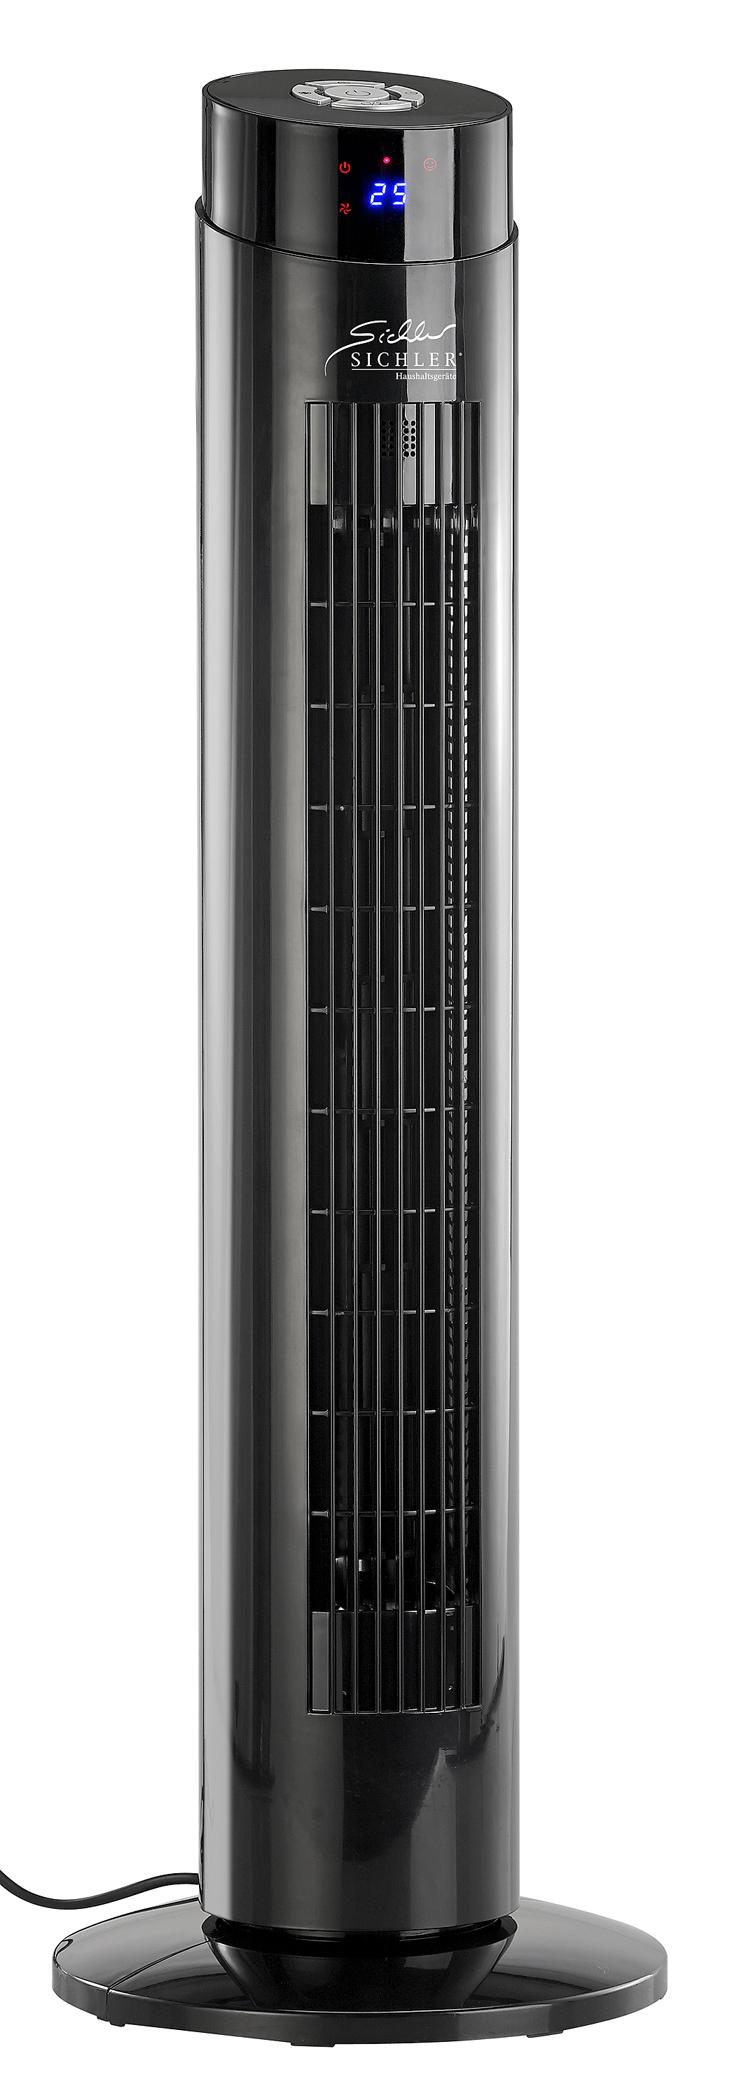 Sichler Turmventilator VT-260.tu mit Ionisator.